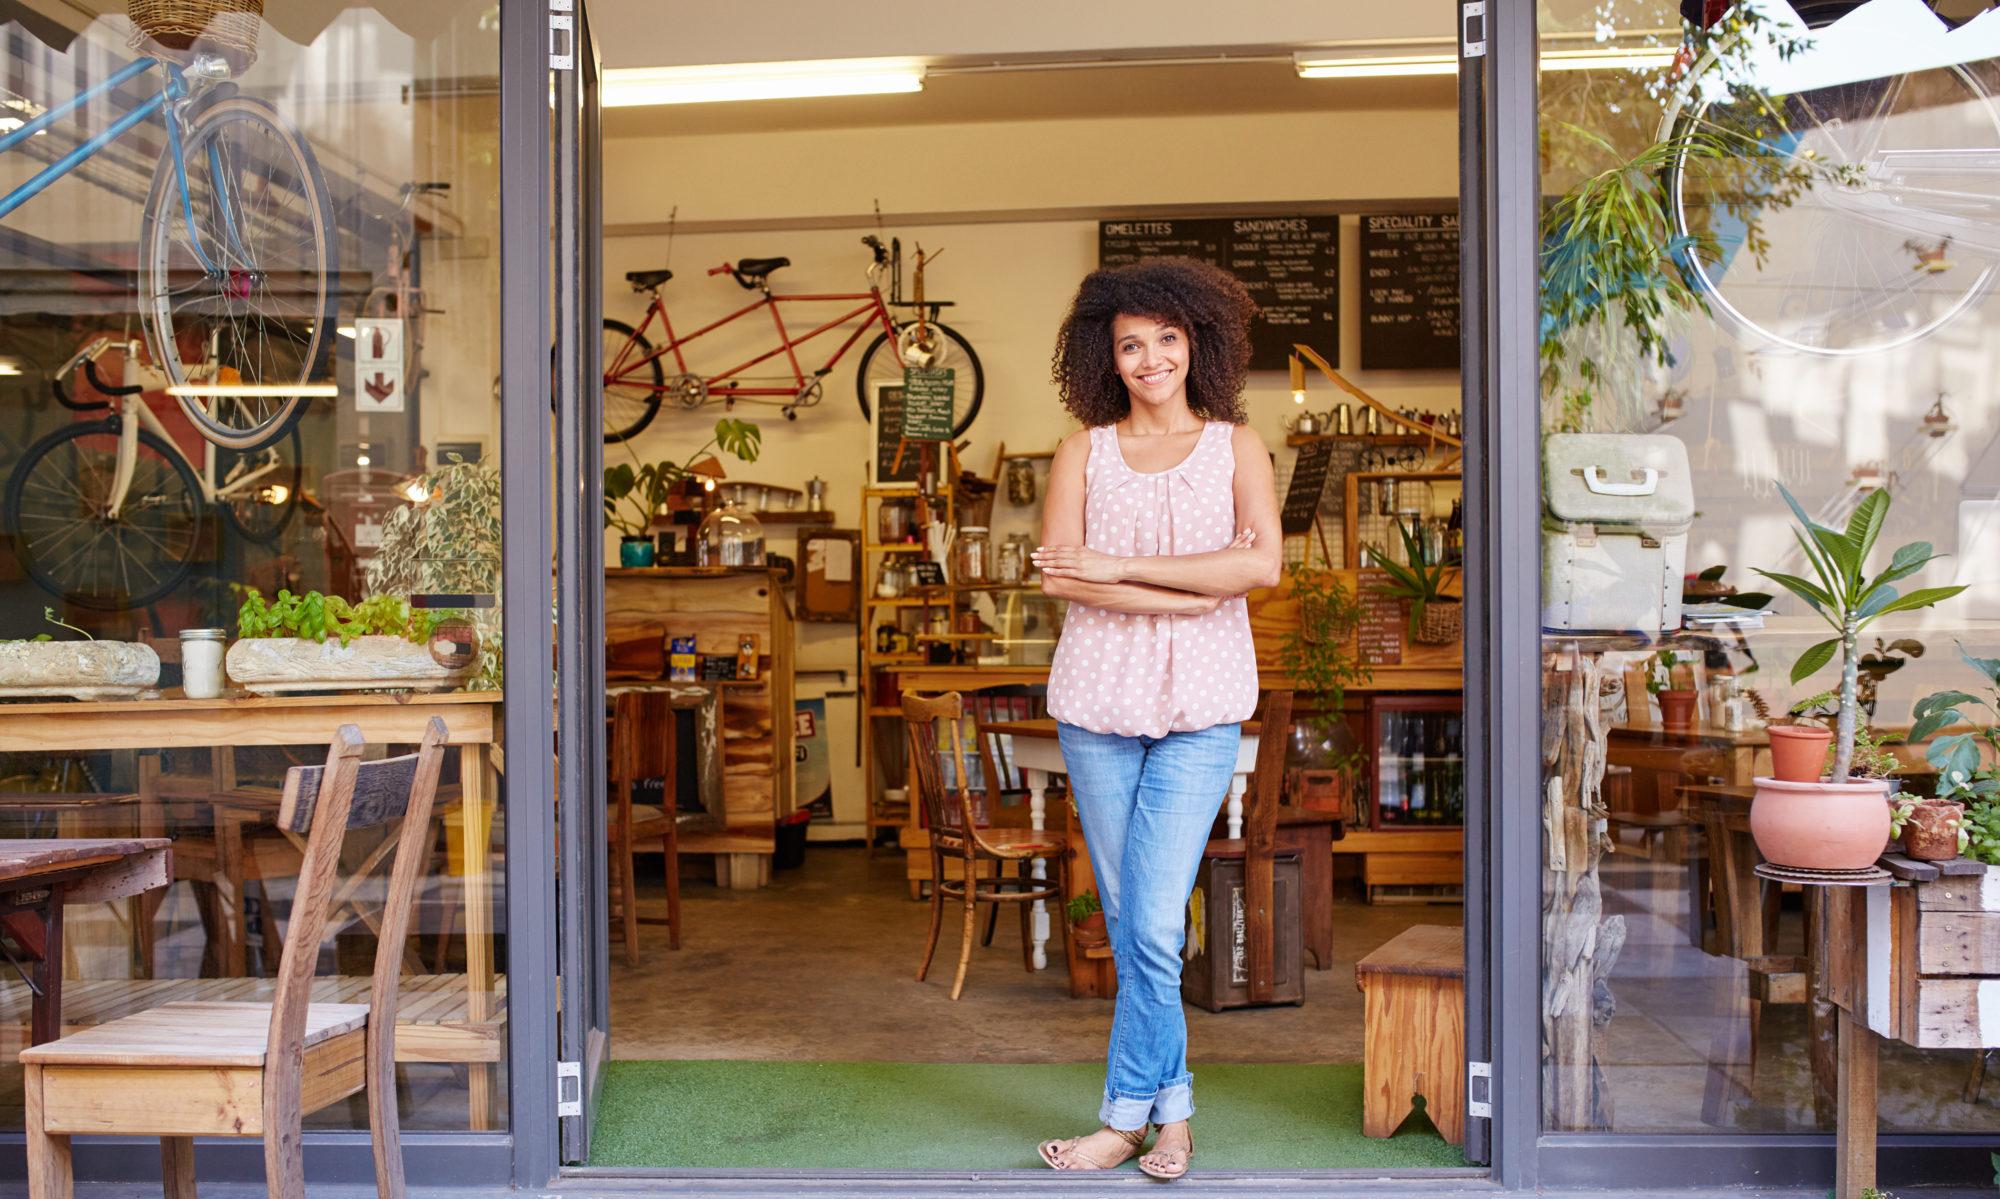 Ritchie Creative Café